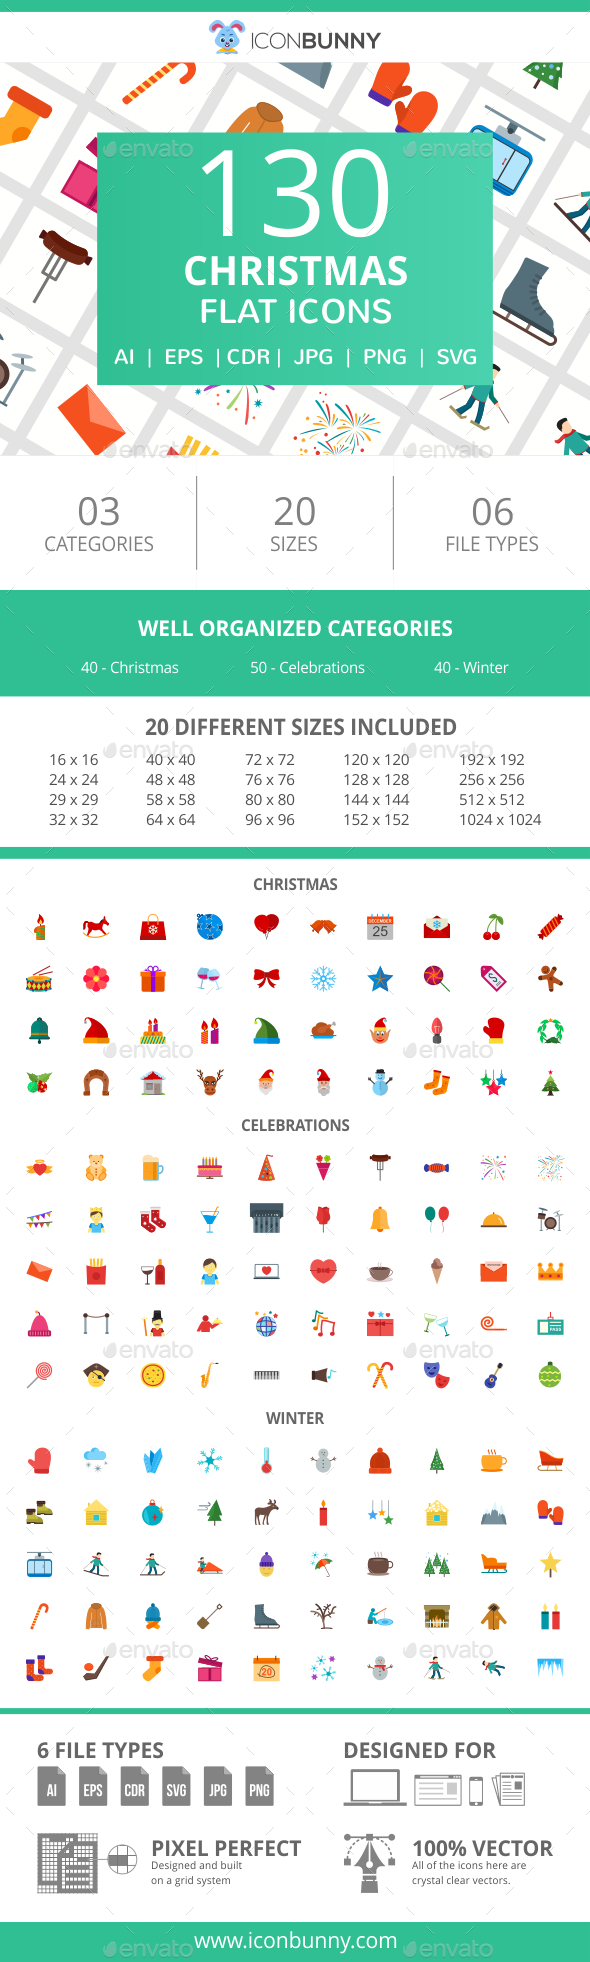 GraphicRiver 130 Christmas Flat Icons 20995007